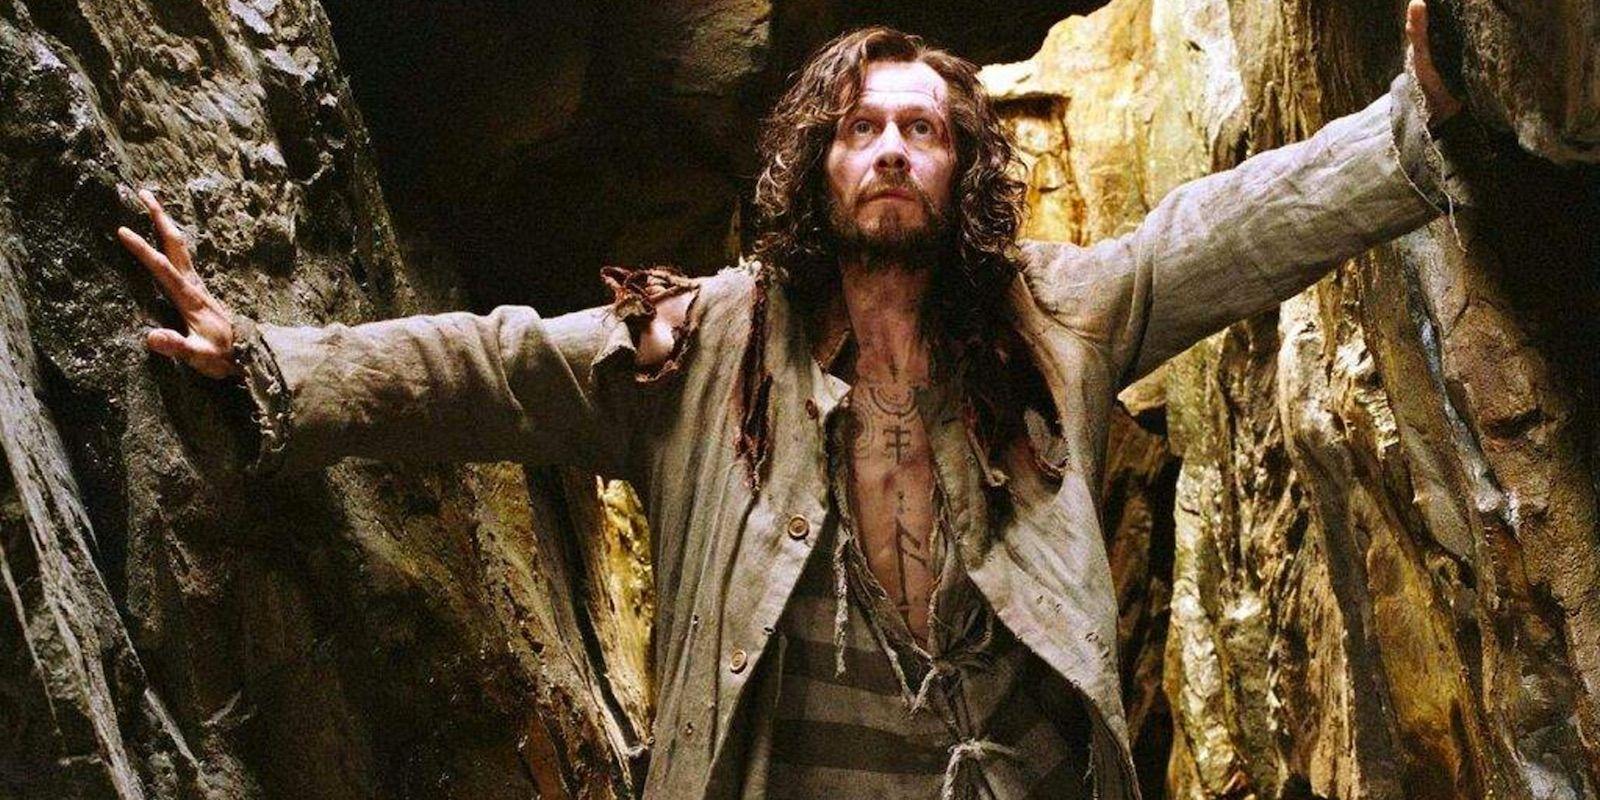 Sirius-Black-in-Azkaban-in-Harry-Potter.